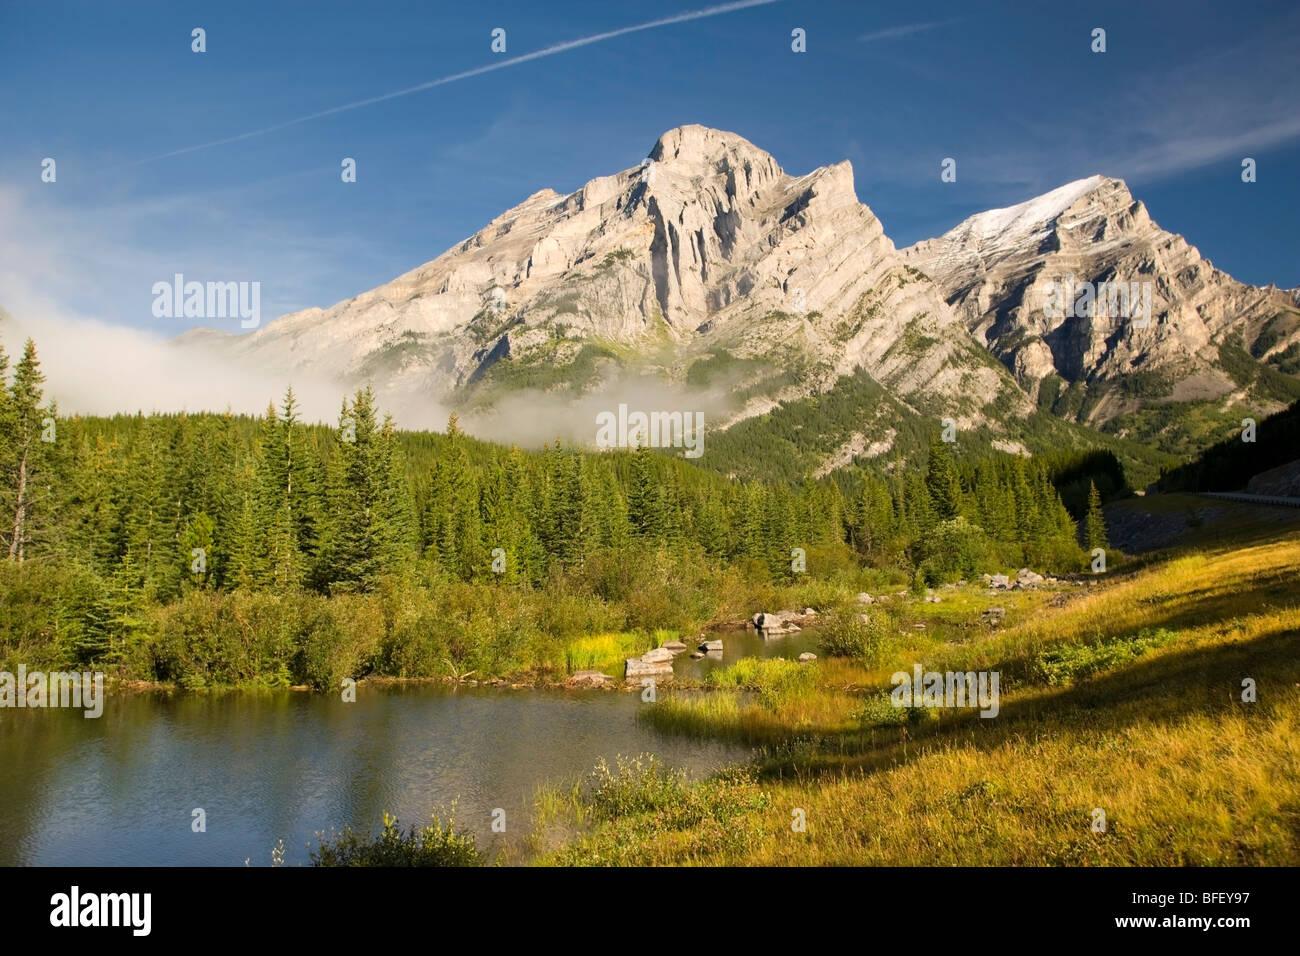 Wedge Pond, Kananaskis Provincial Park, Alberta, Canada, mountain, lake, reflection, trees, fog - Stock Image